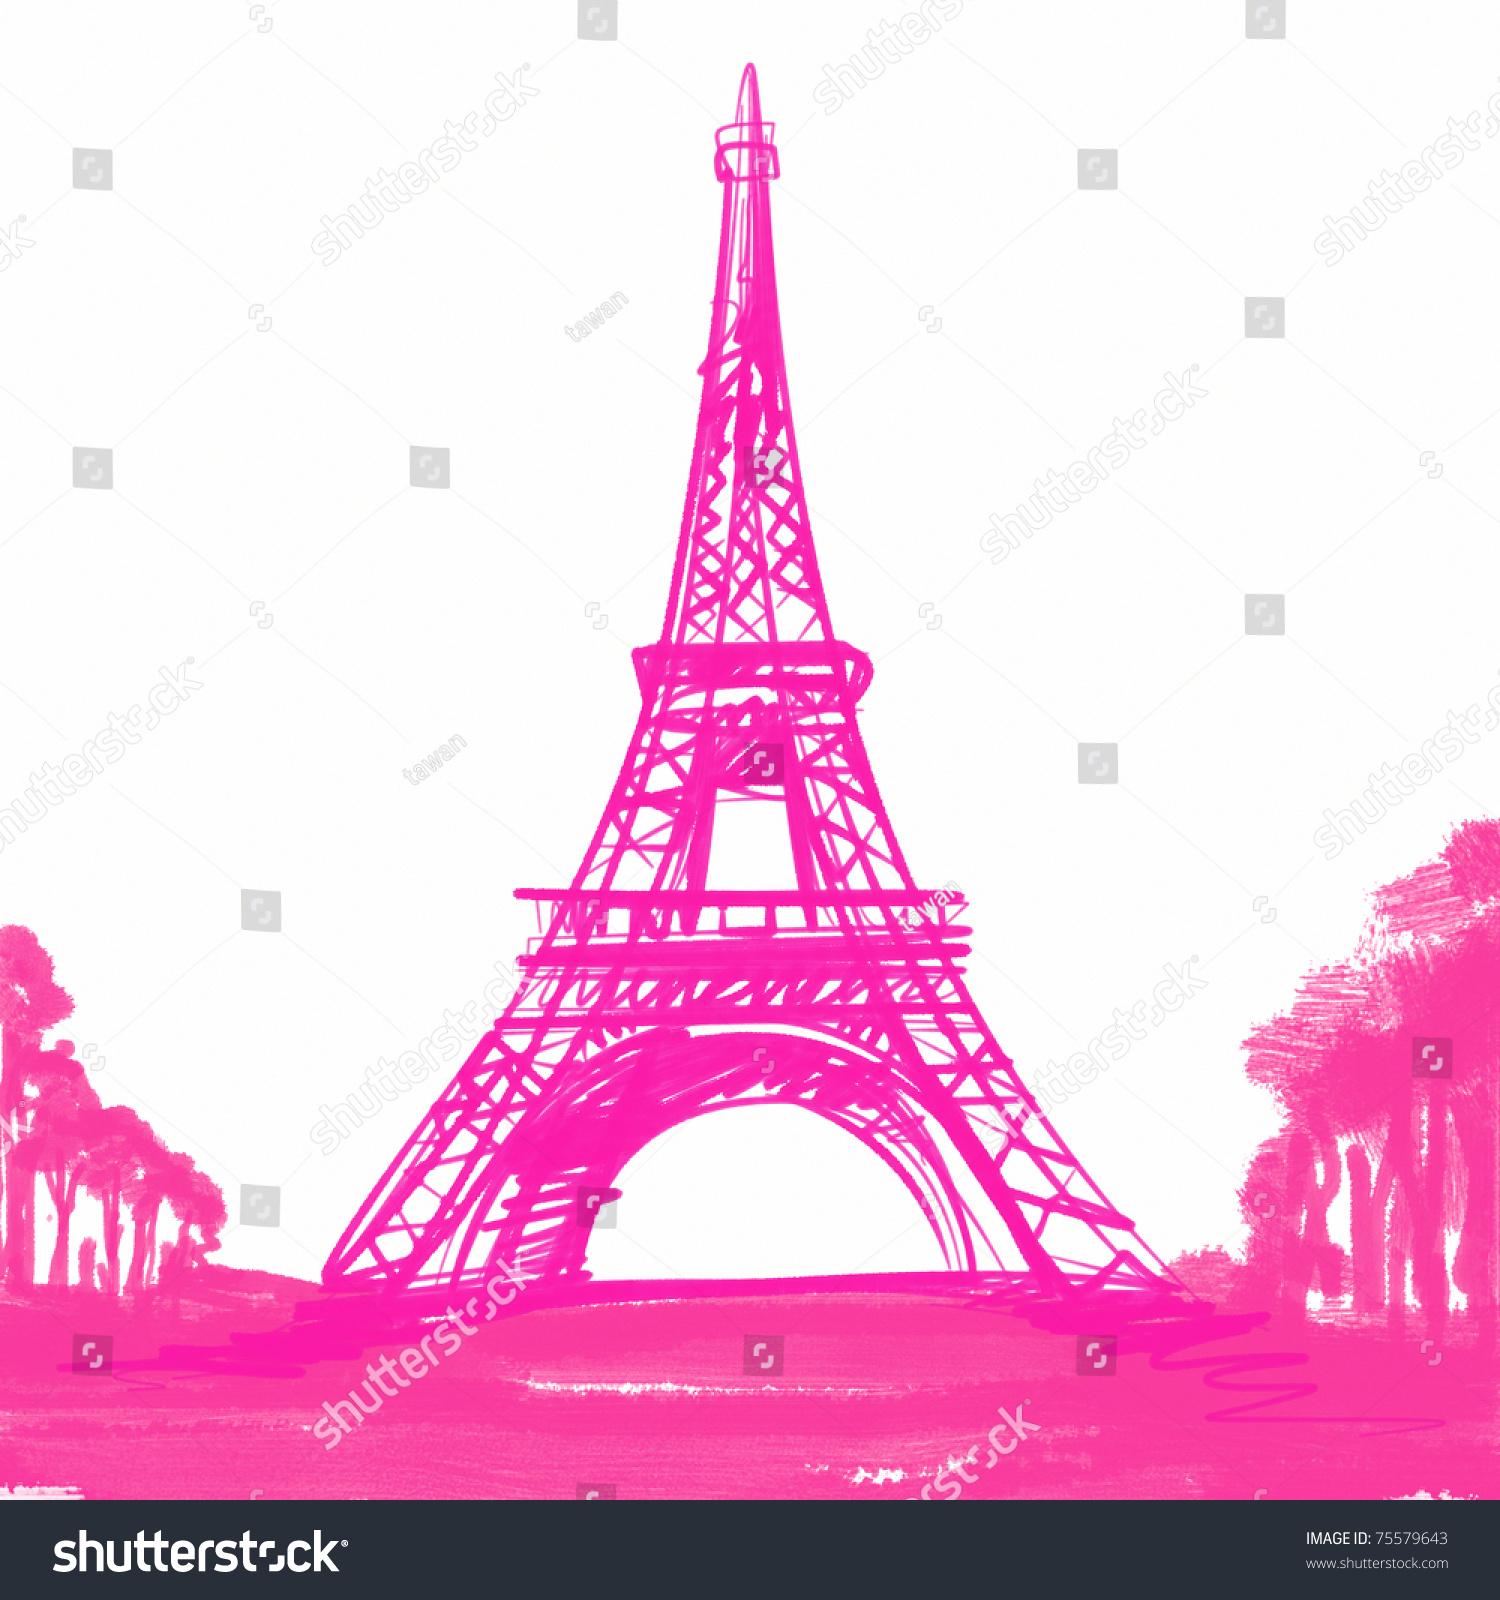 As Creation Pink Paris Pattern Eiffel Tower Childrens: Pink Eiffel Tower Paris Europe Stock Illustration 75579643